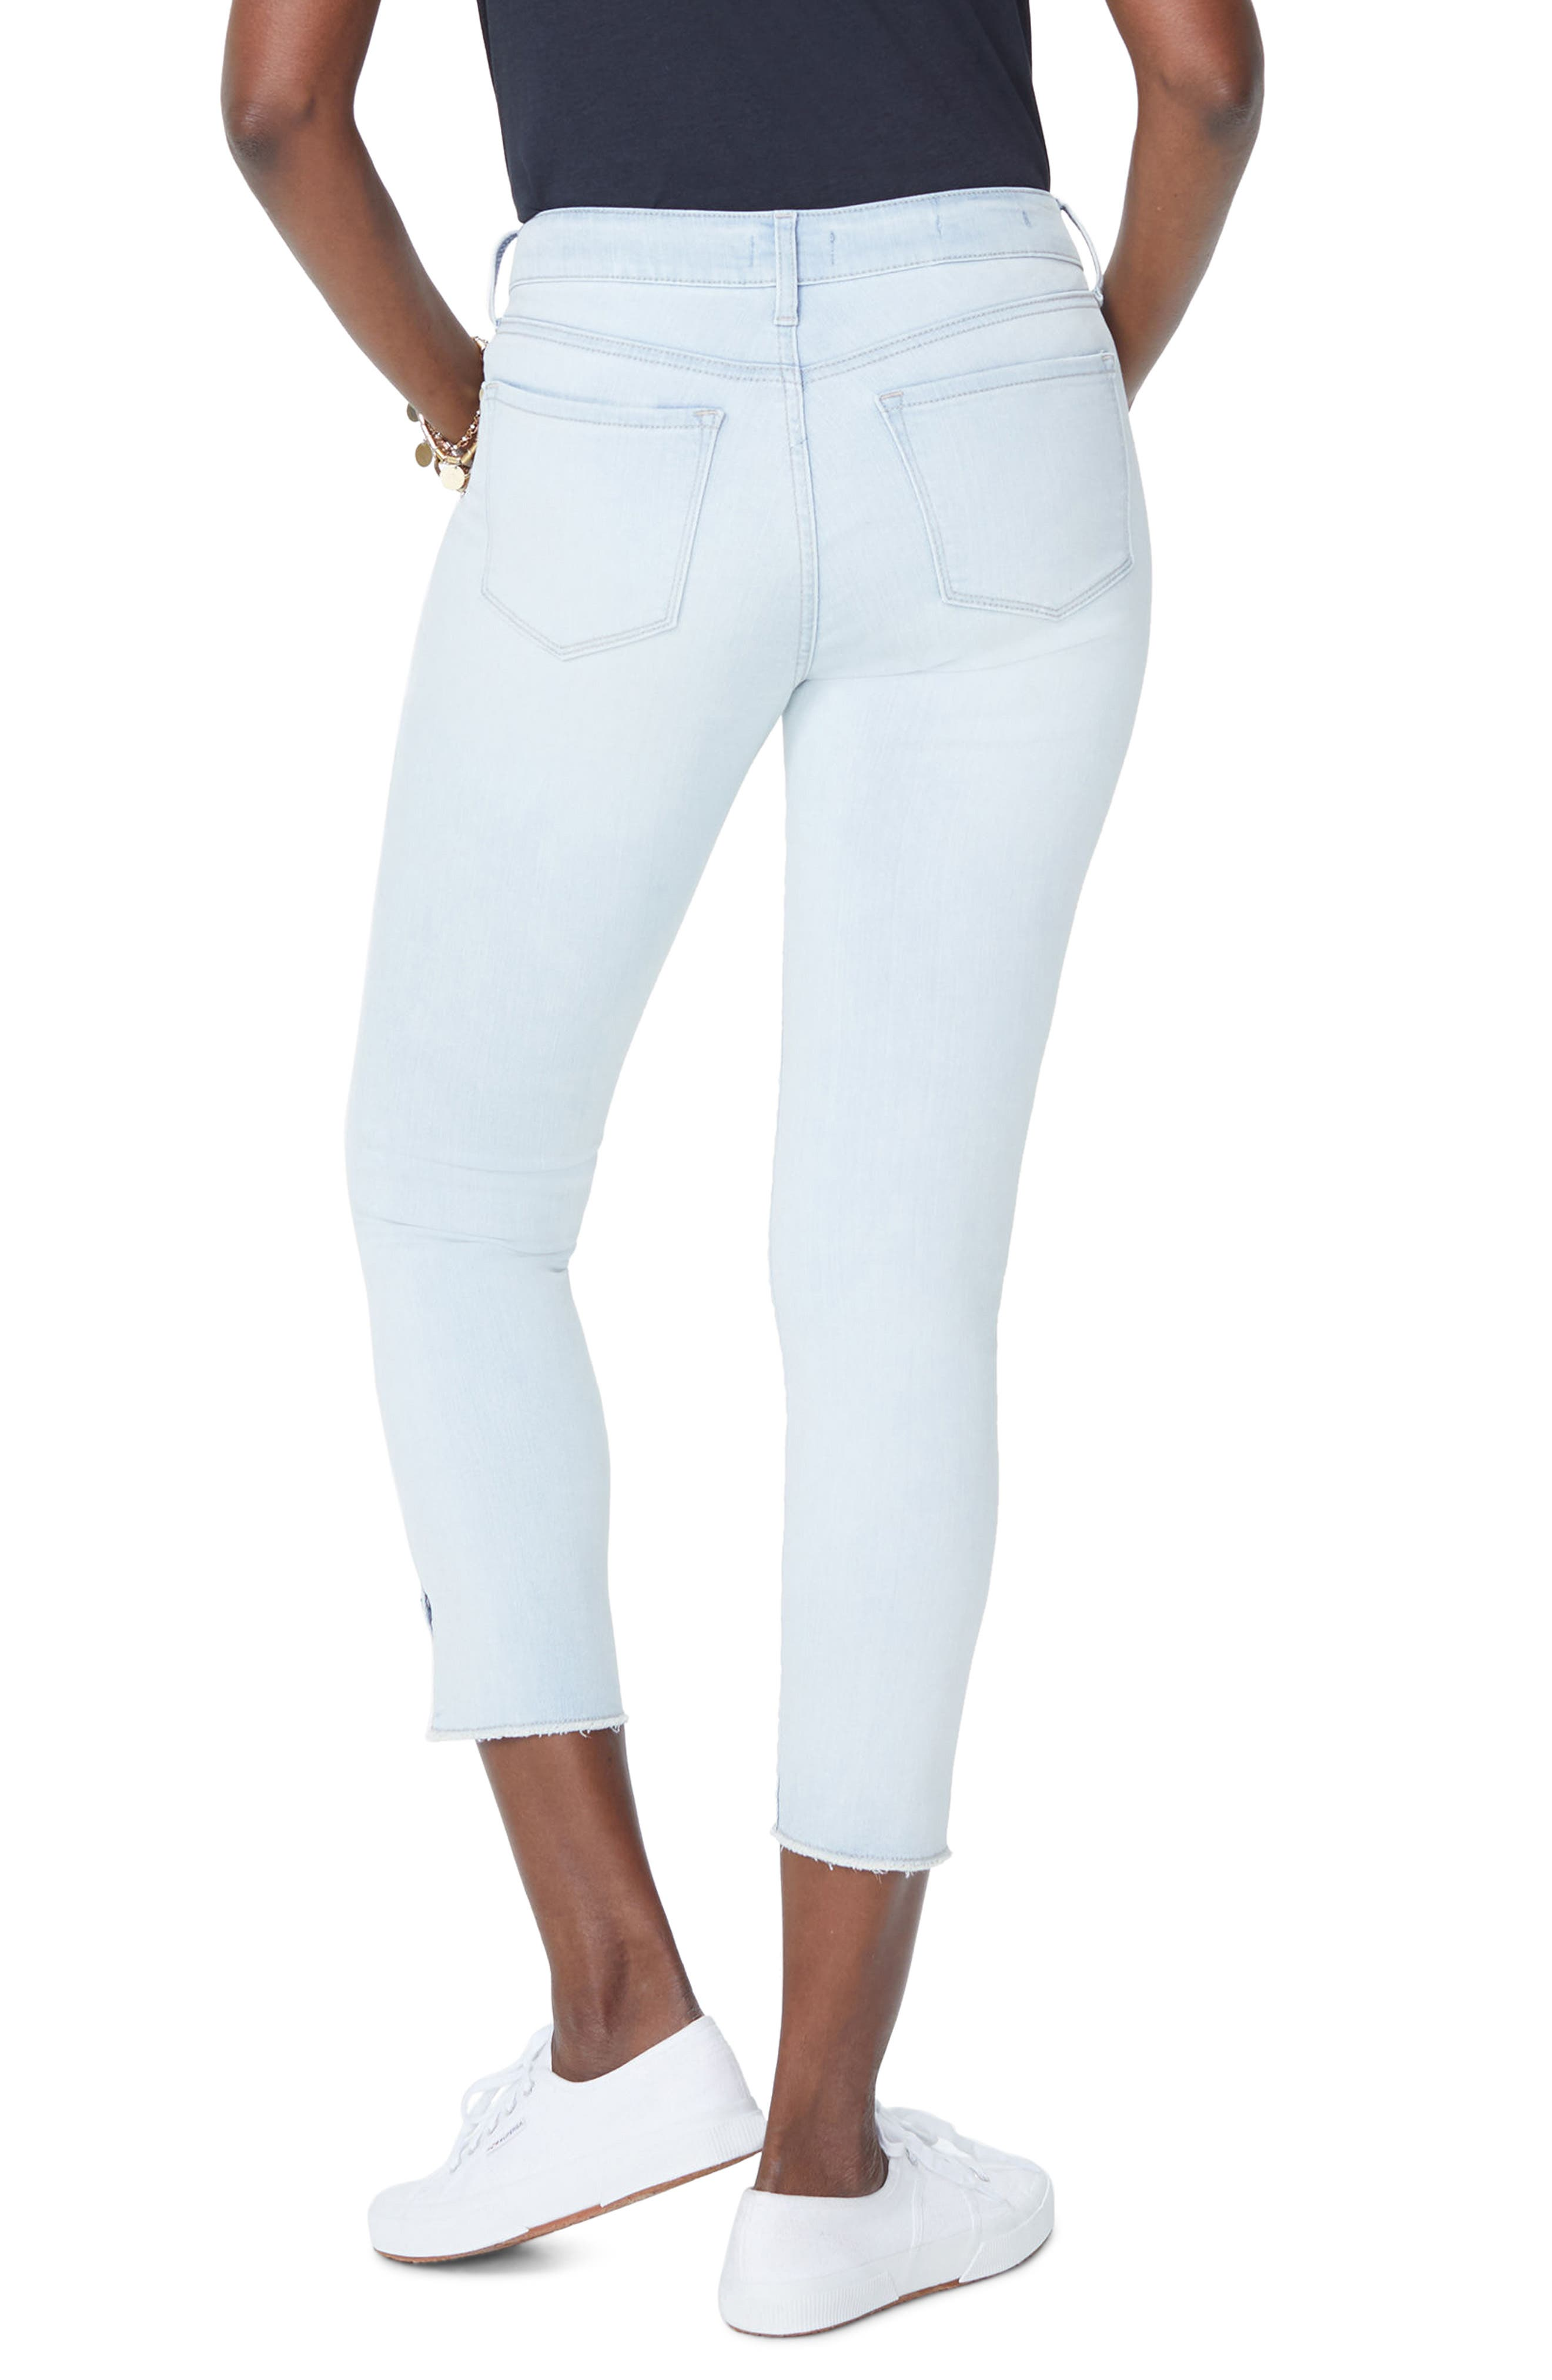 Ami High Waist Twist Seam Stretch Ankle Skinny Jeans,                             Alternate thumbnail 2, color,                             PALM DESERT